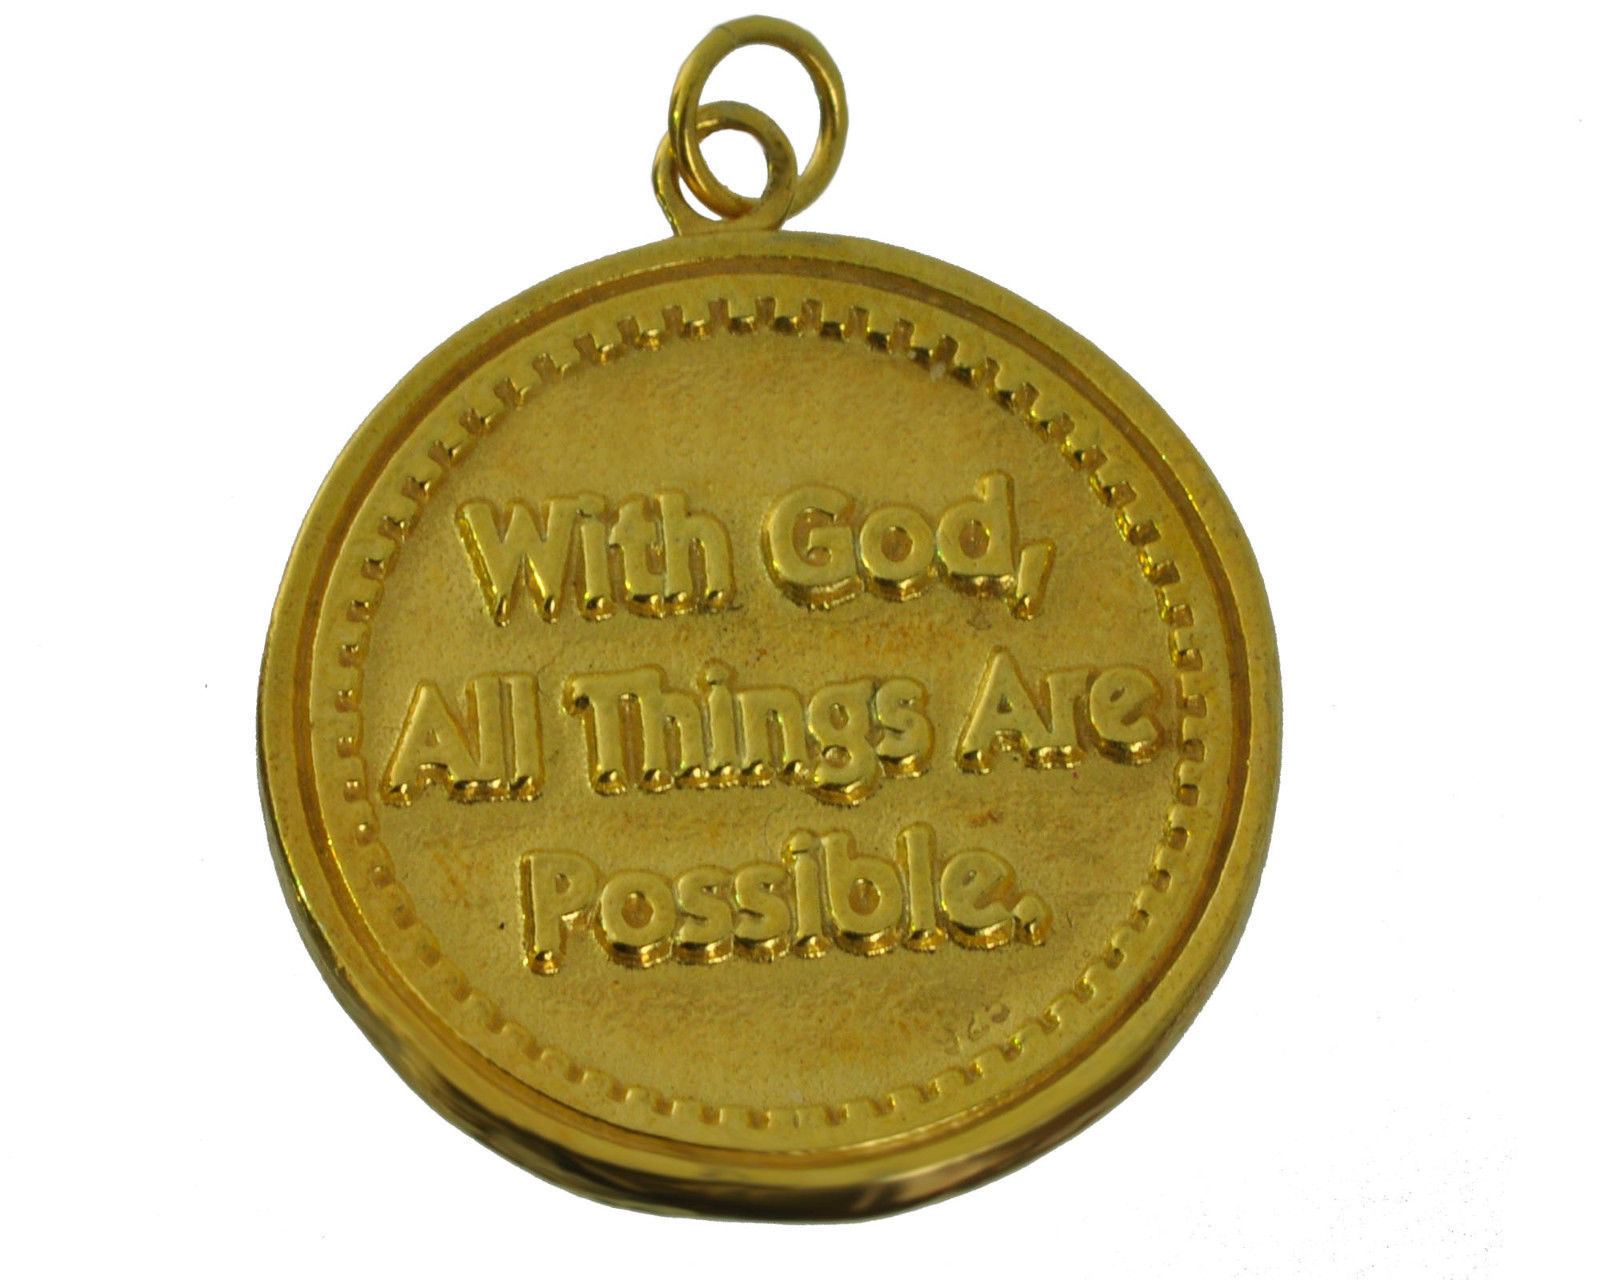 Skateboards Skateboard Deck Trust God safety Protect charm 24K Gold Pltd Jewelry